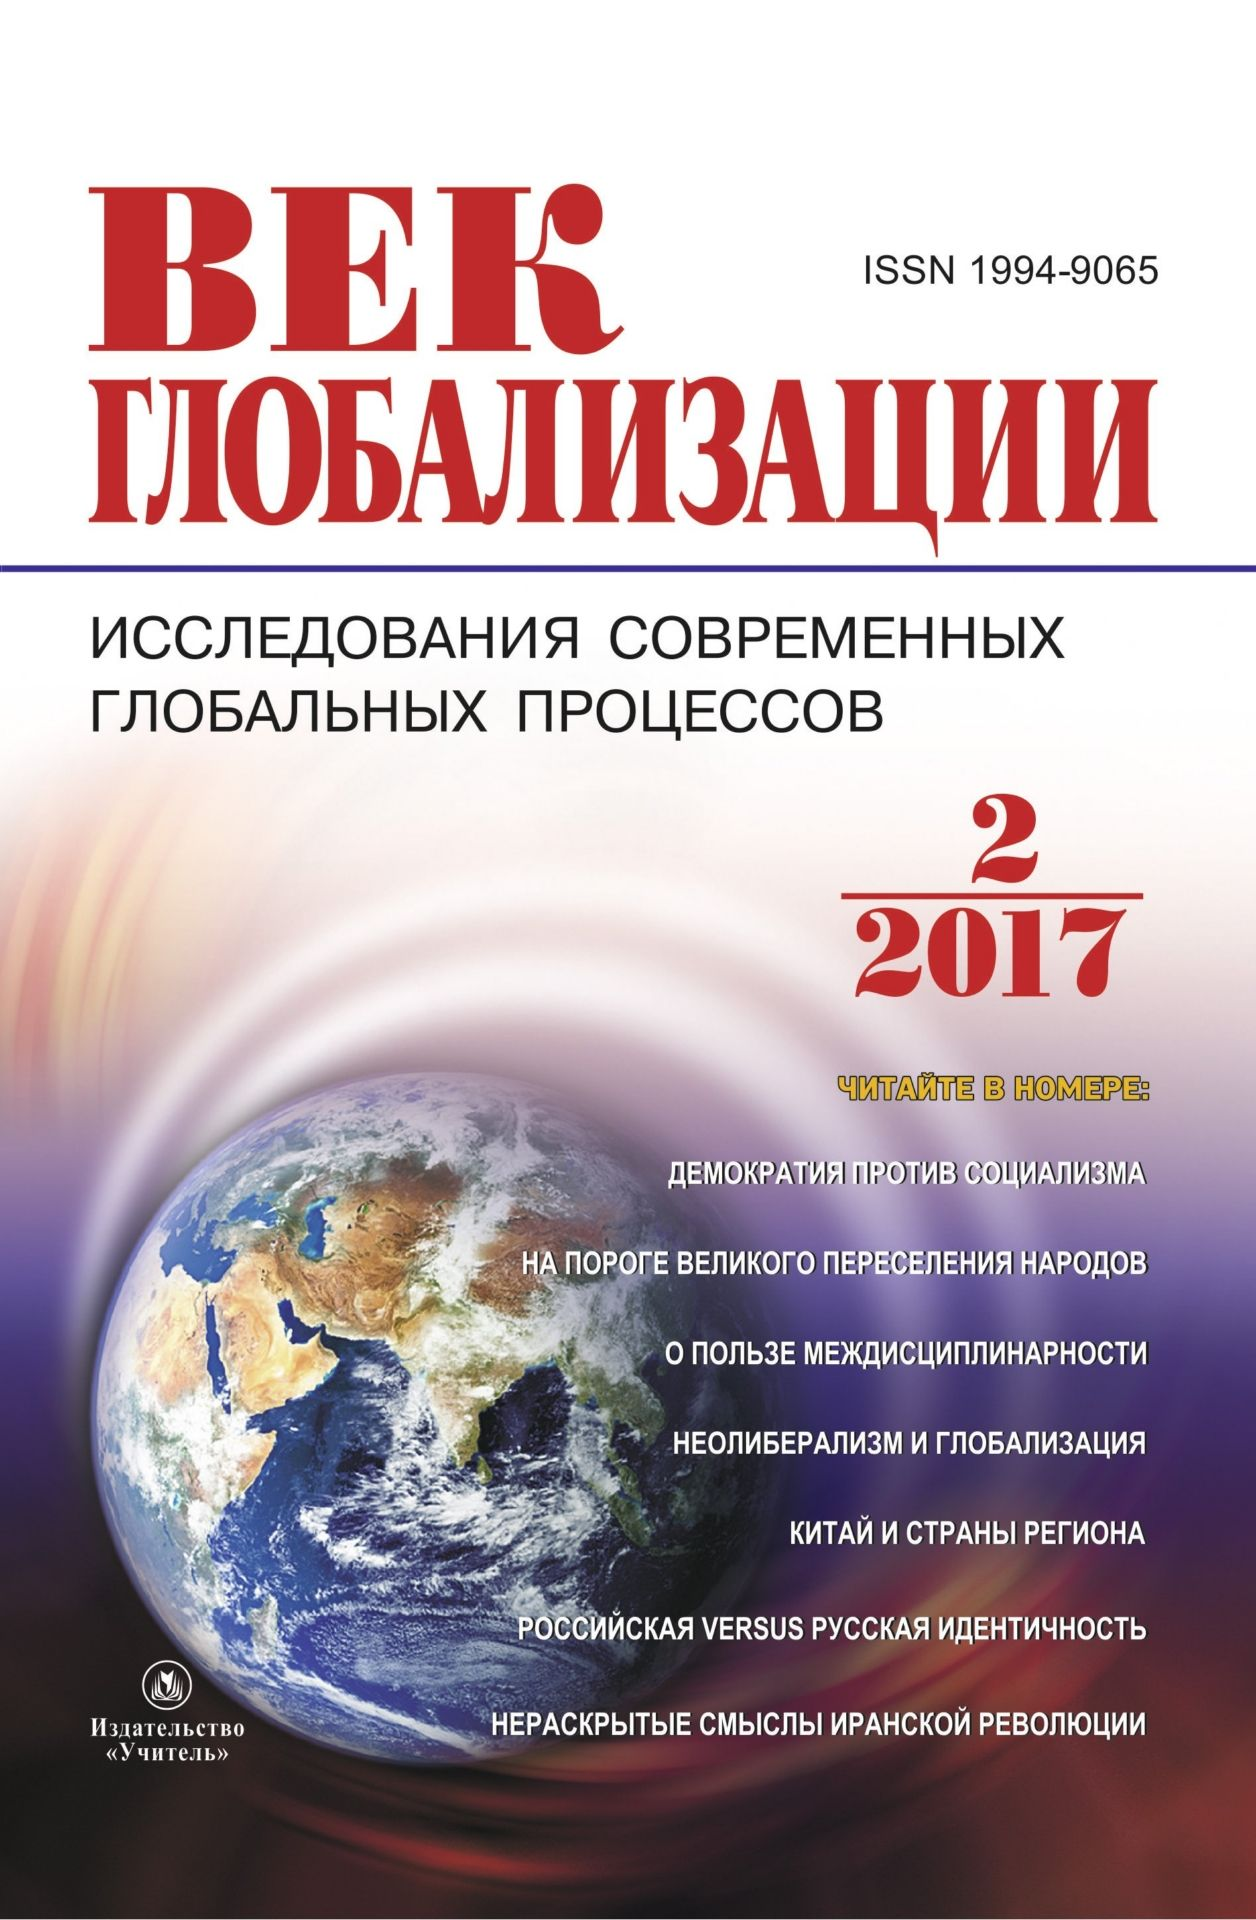 Журнал Век глобализации № 2 2017